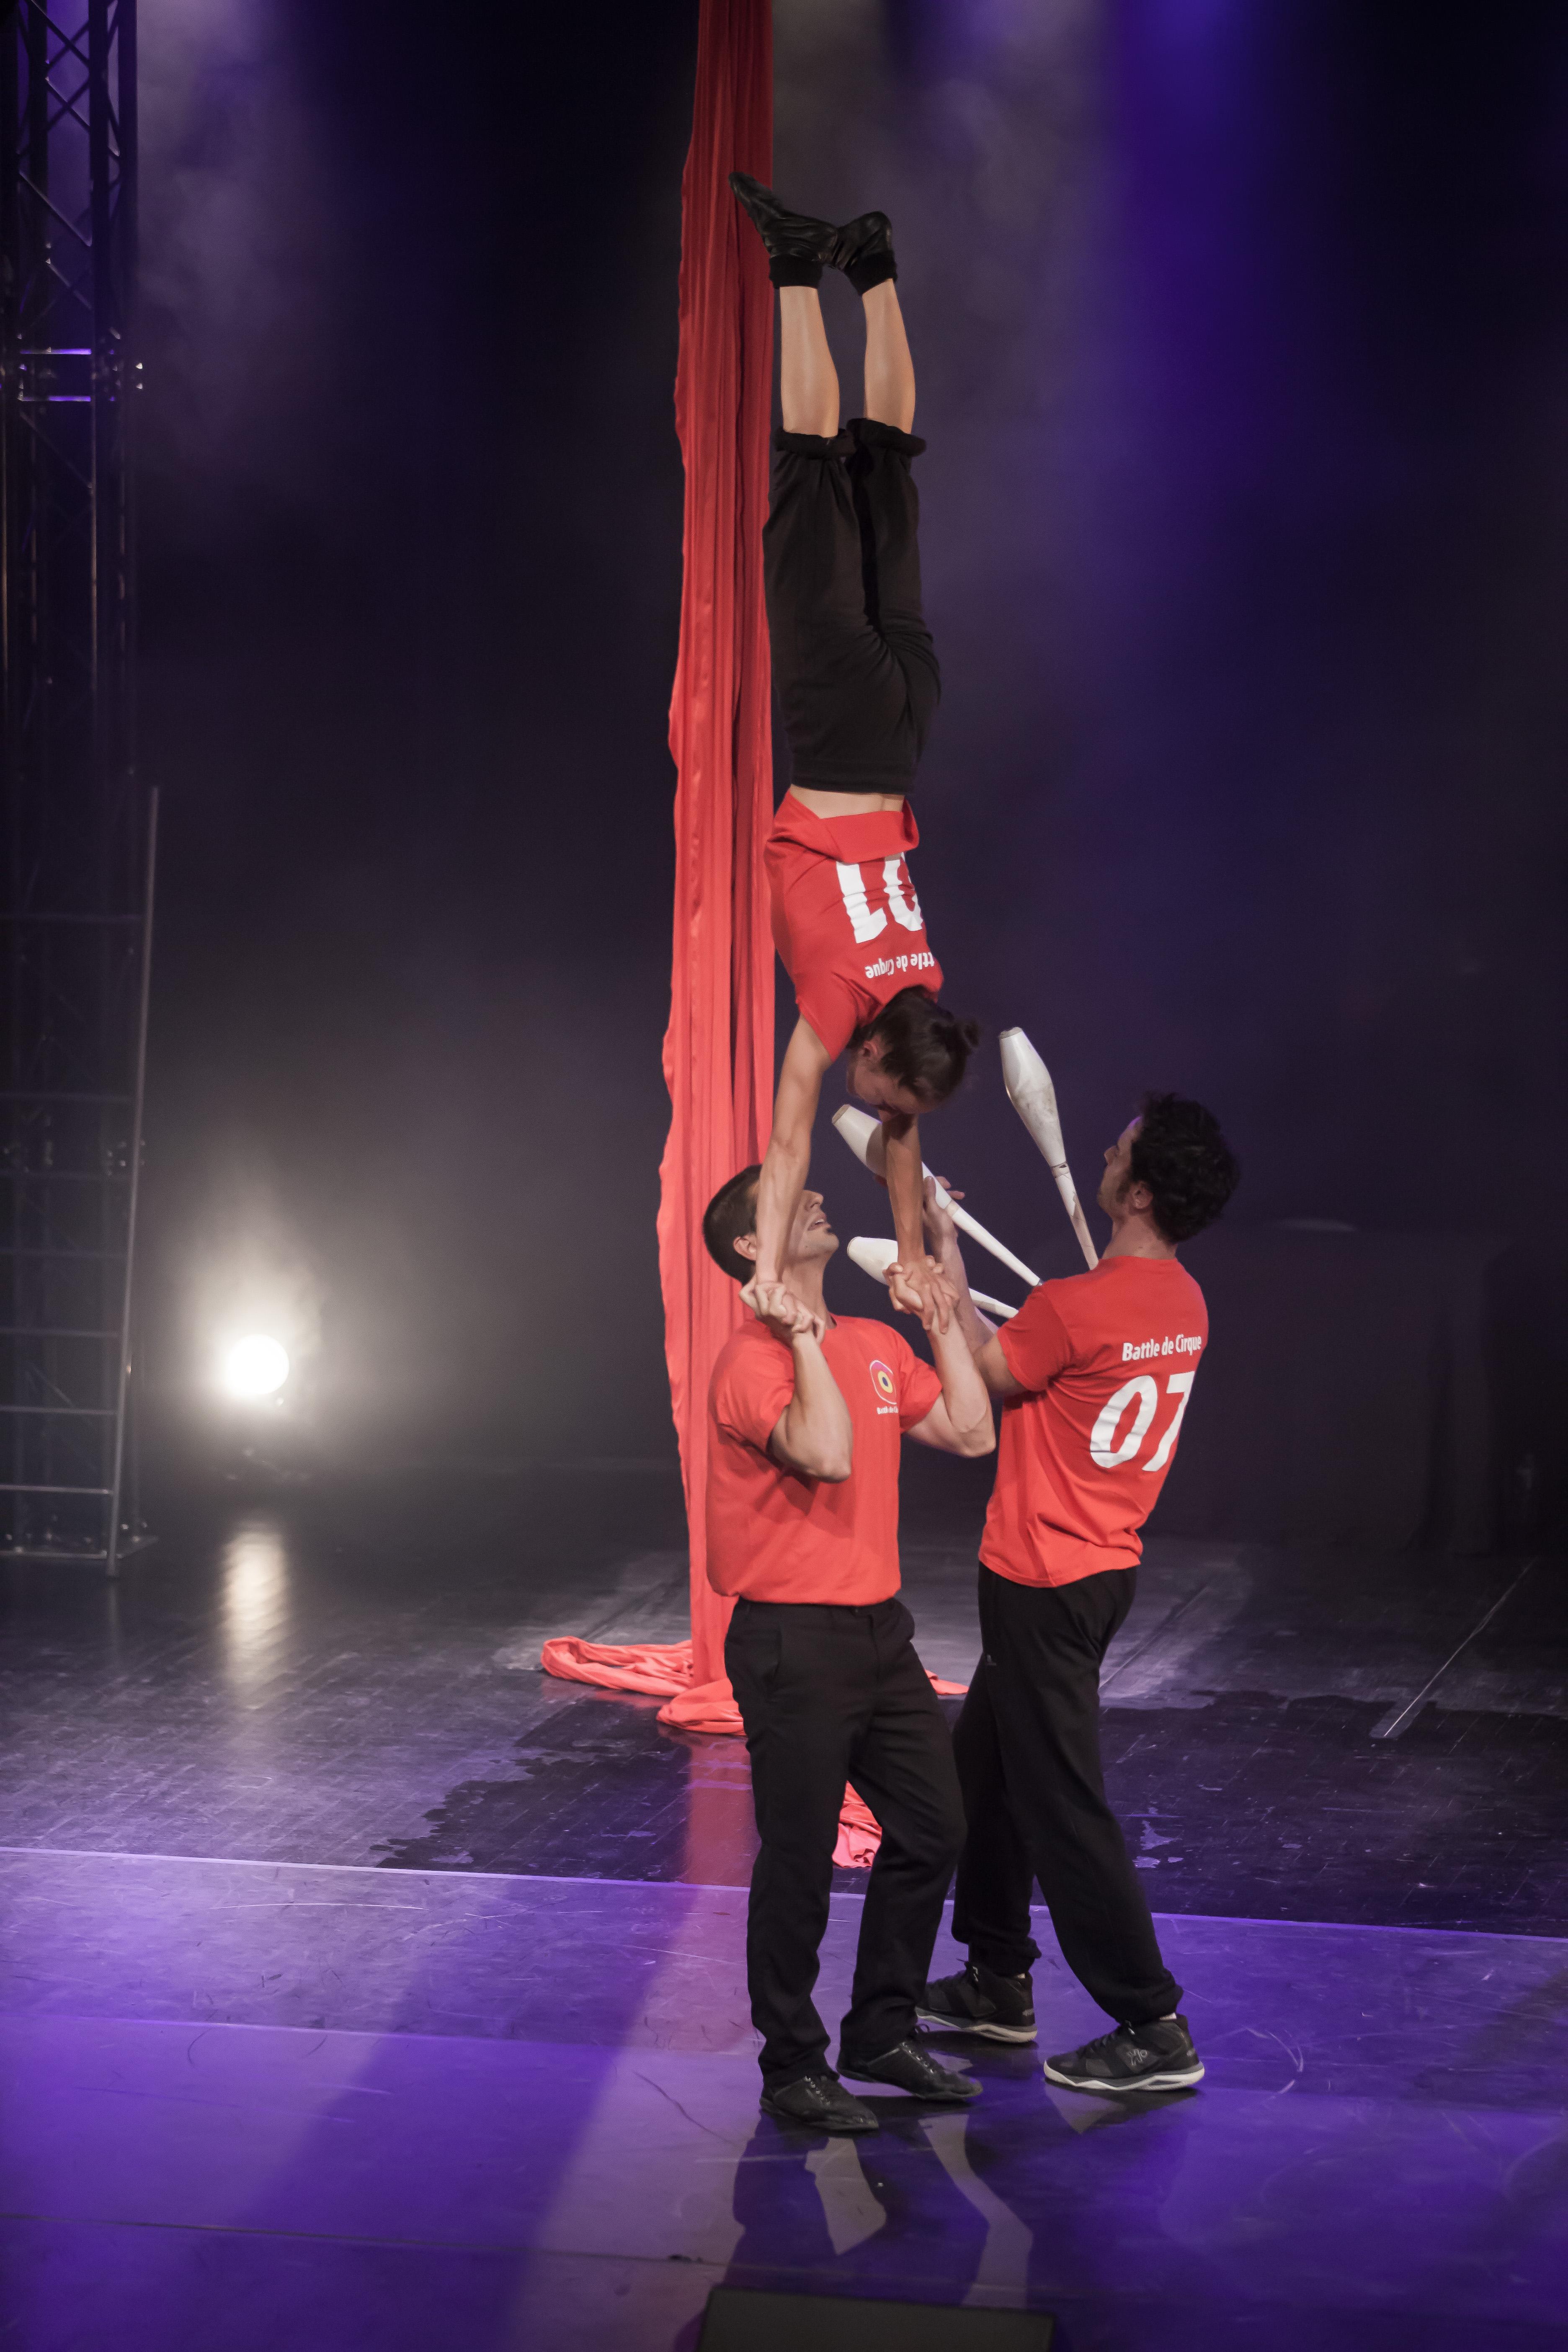 170701-battle-cirque-jdufresne-41_35024258363_o